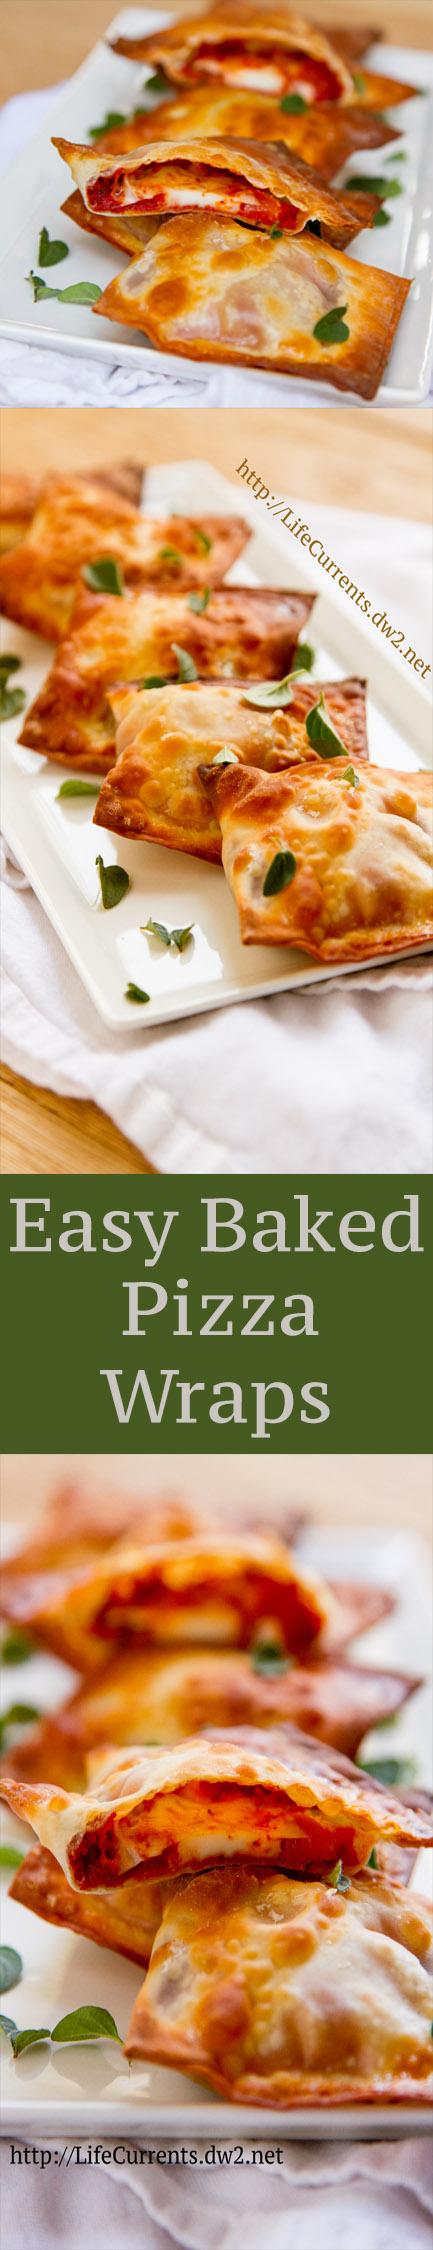 Baked Pizza Wraps recipe